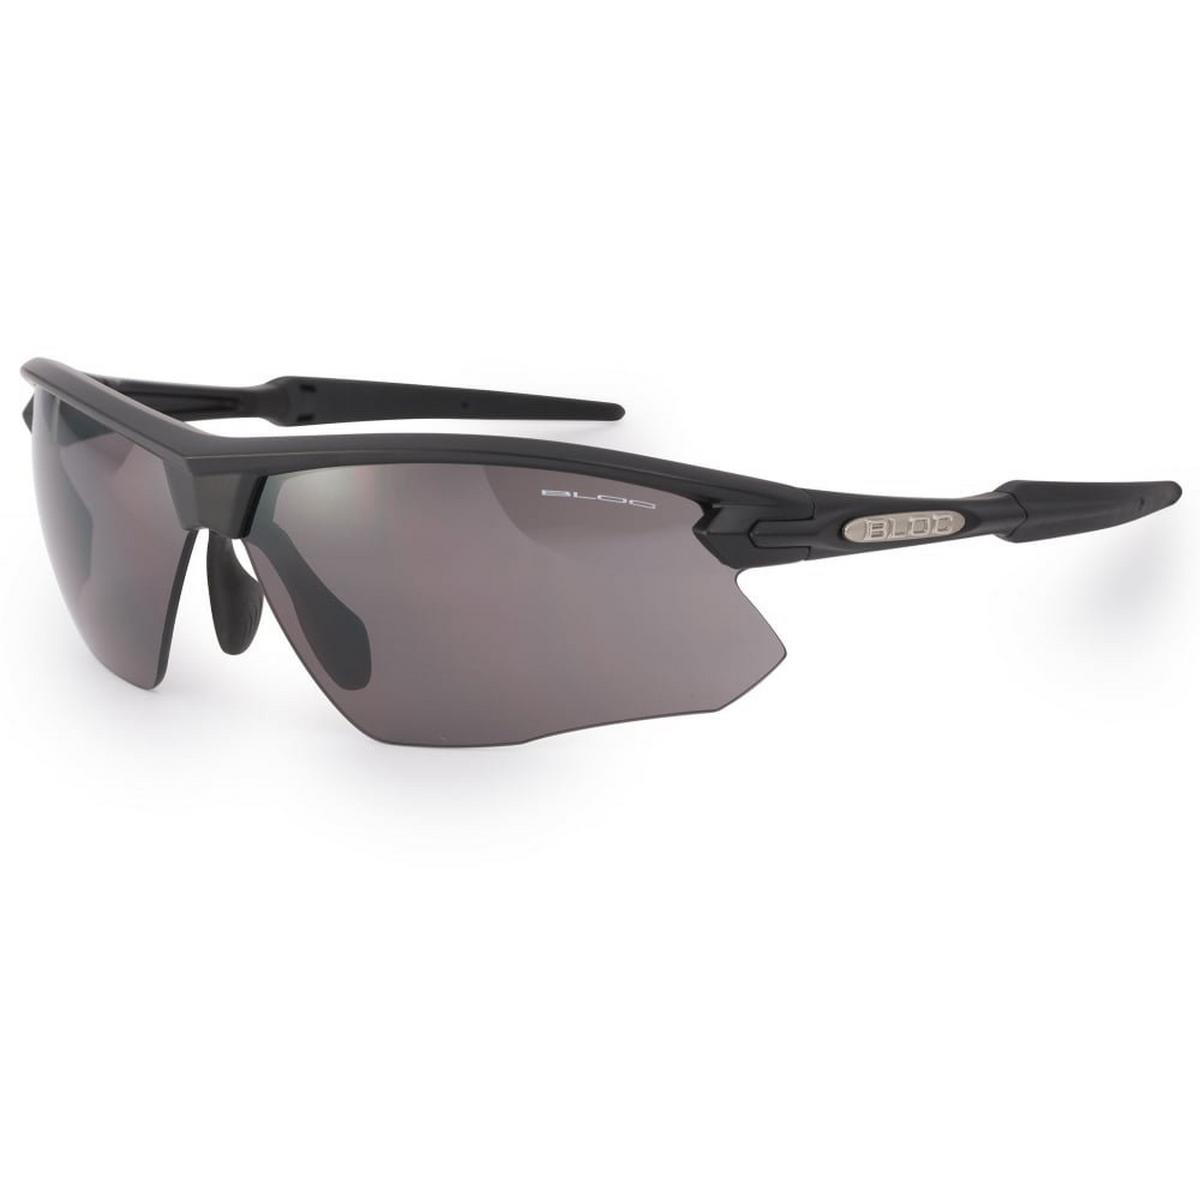 Bloc Fox X761 Sunglasses